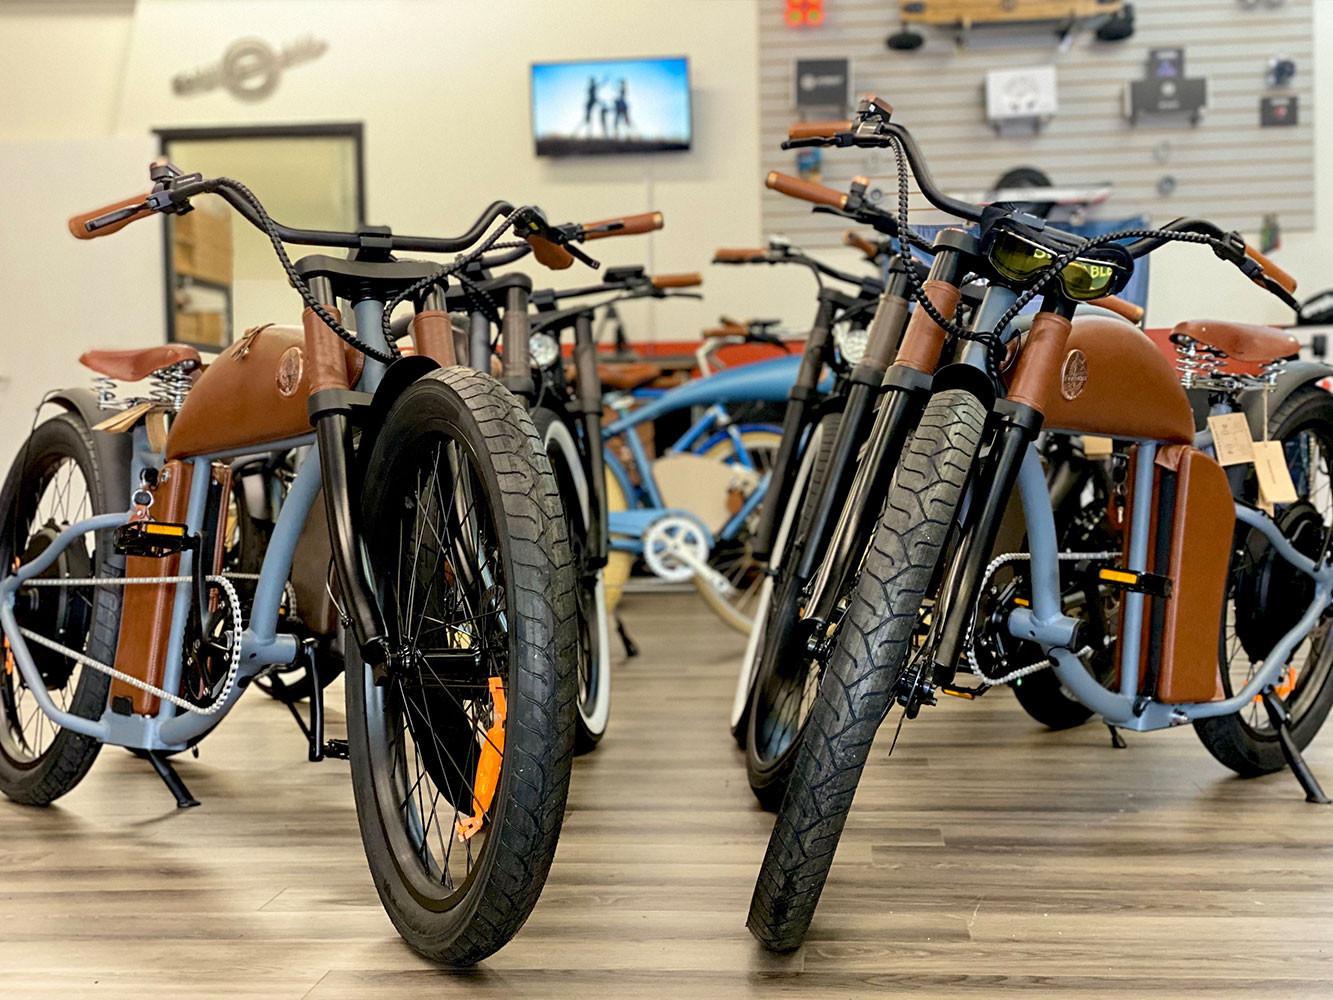 OSBS Has The E-Bike Brands You Love: Rayvolt & Spark Cycleworks